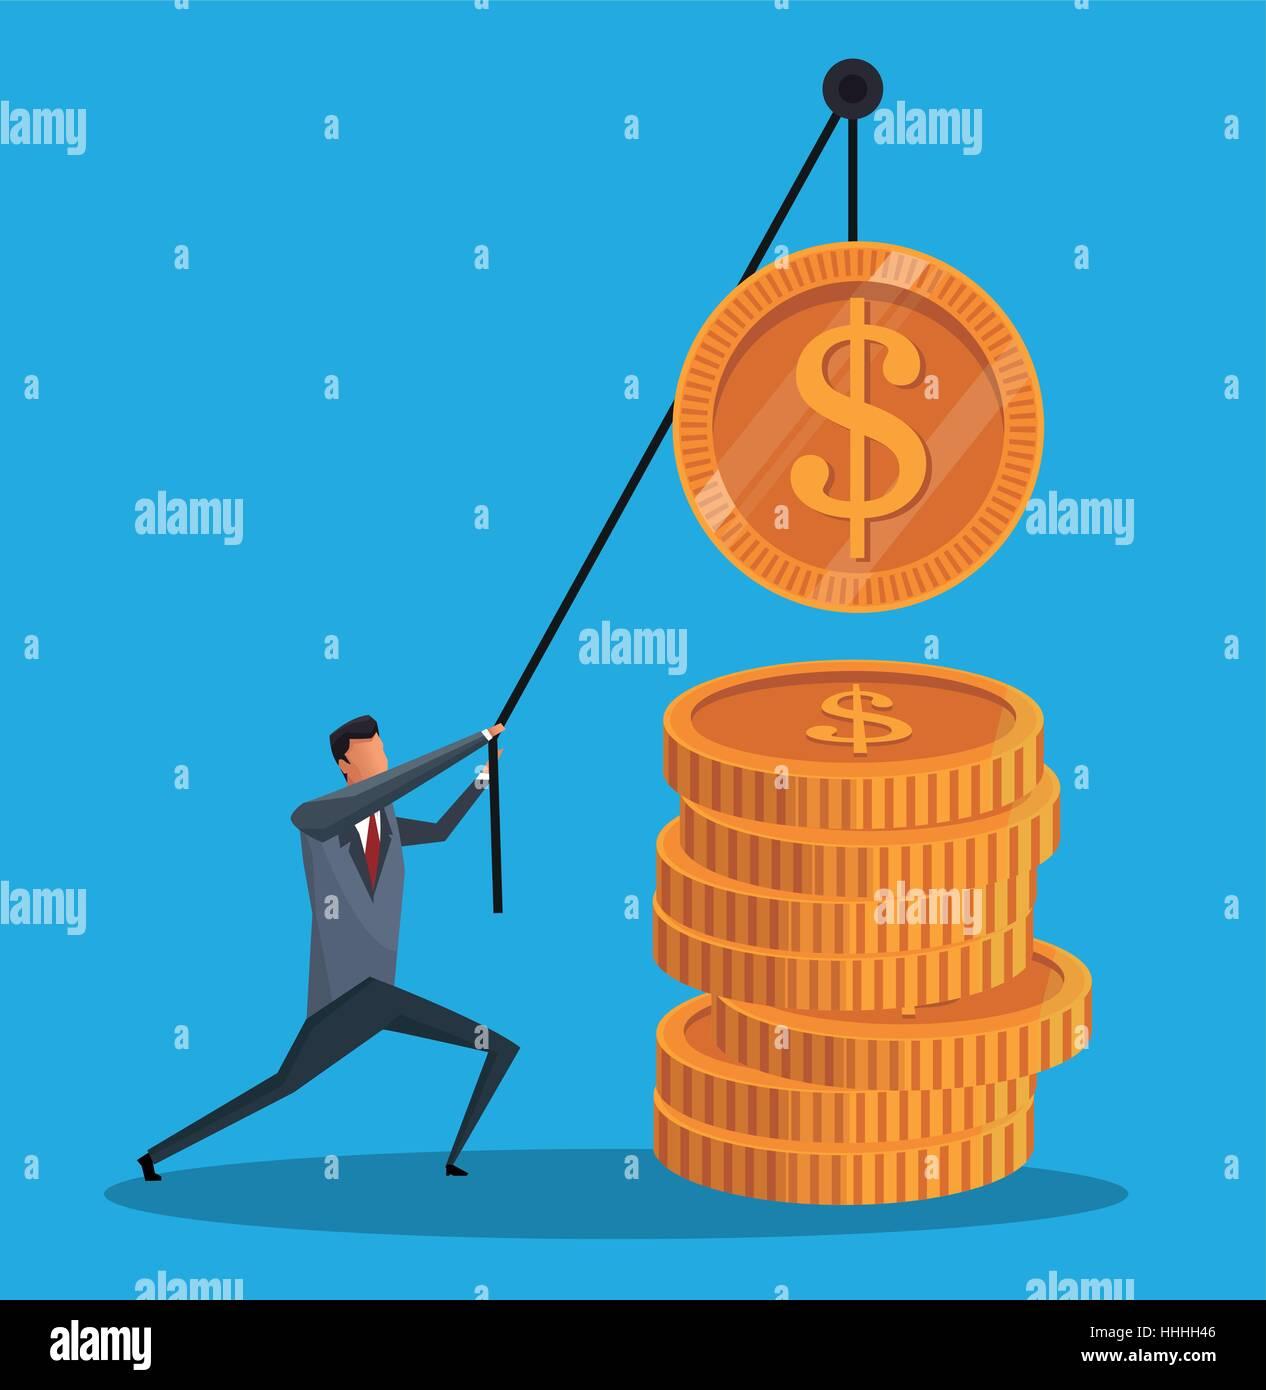 man financial business money gold work - Stock Image